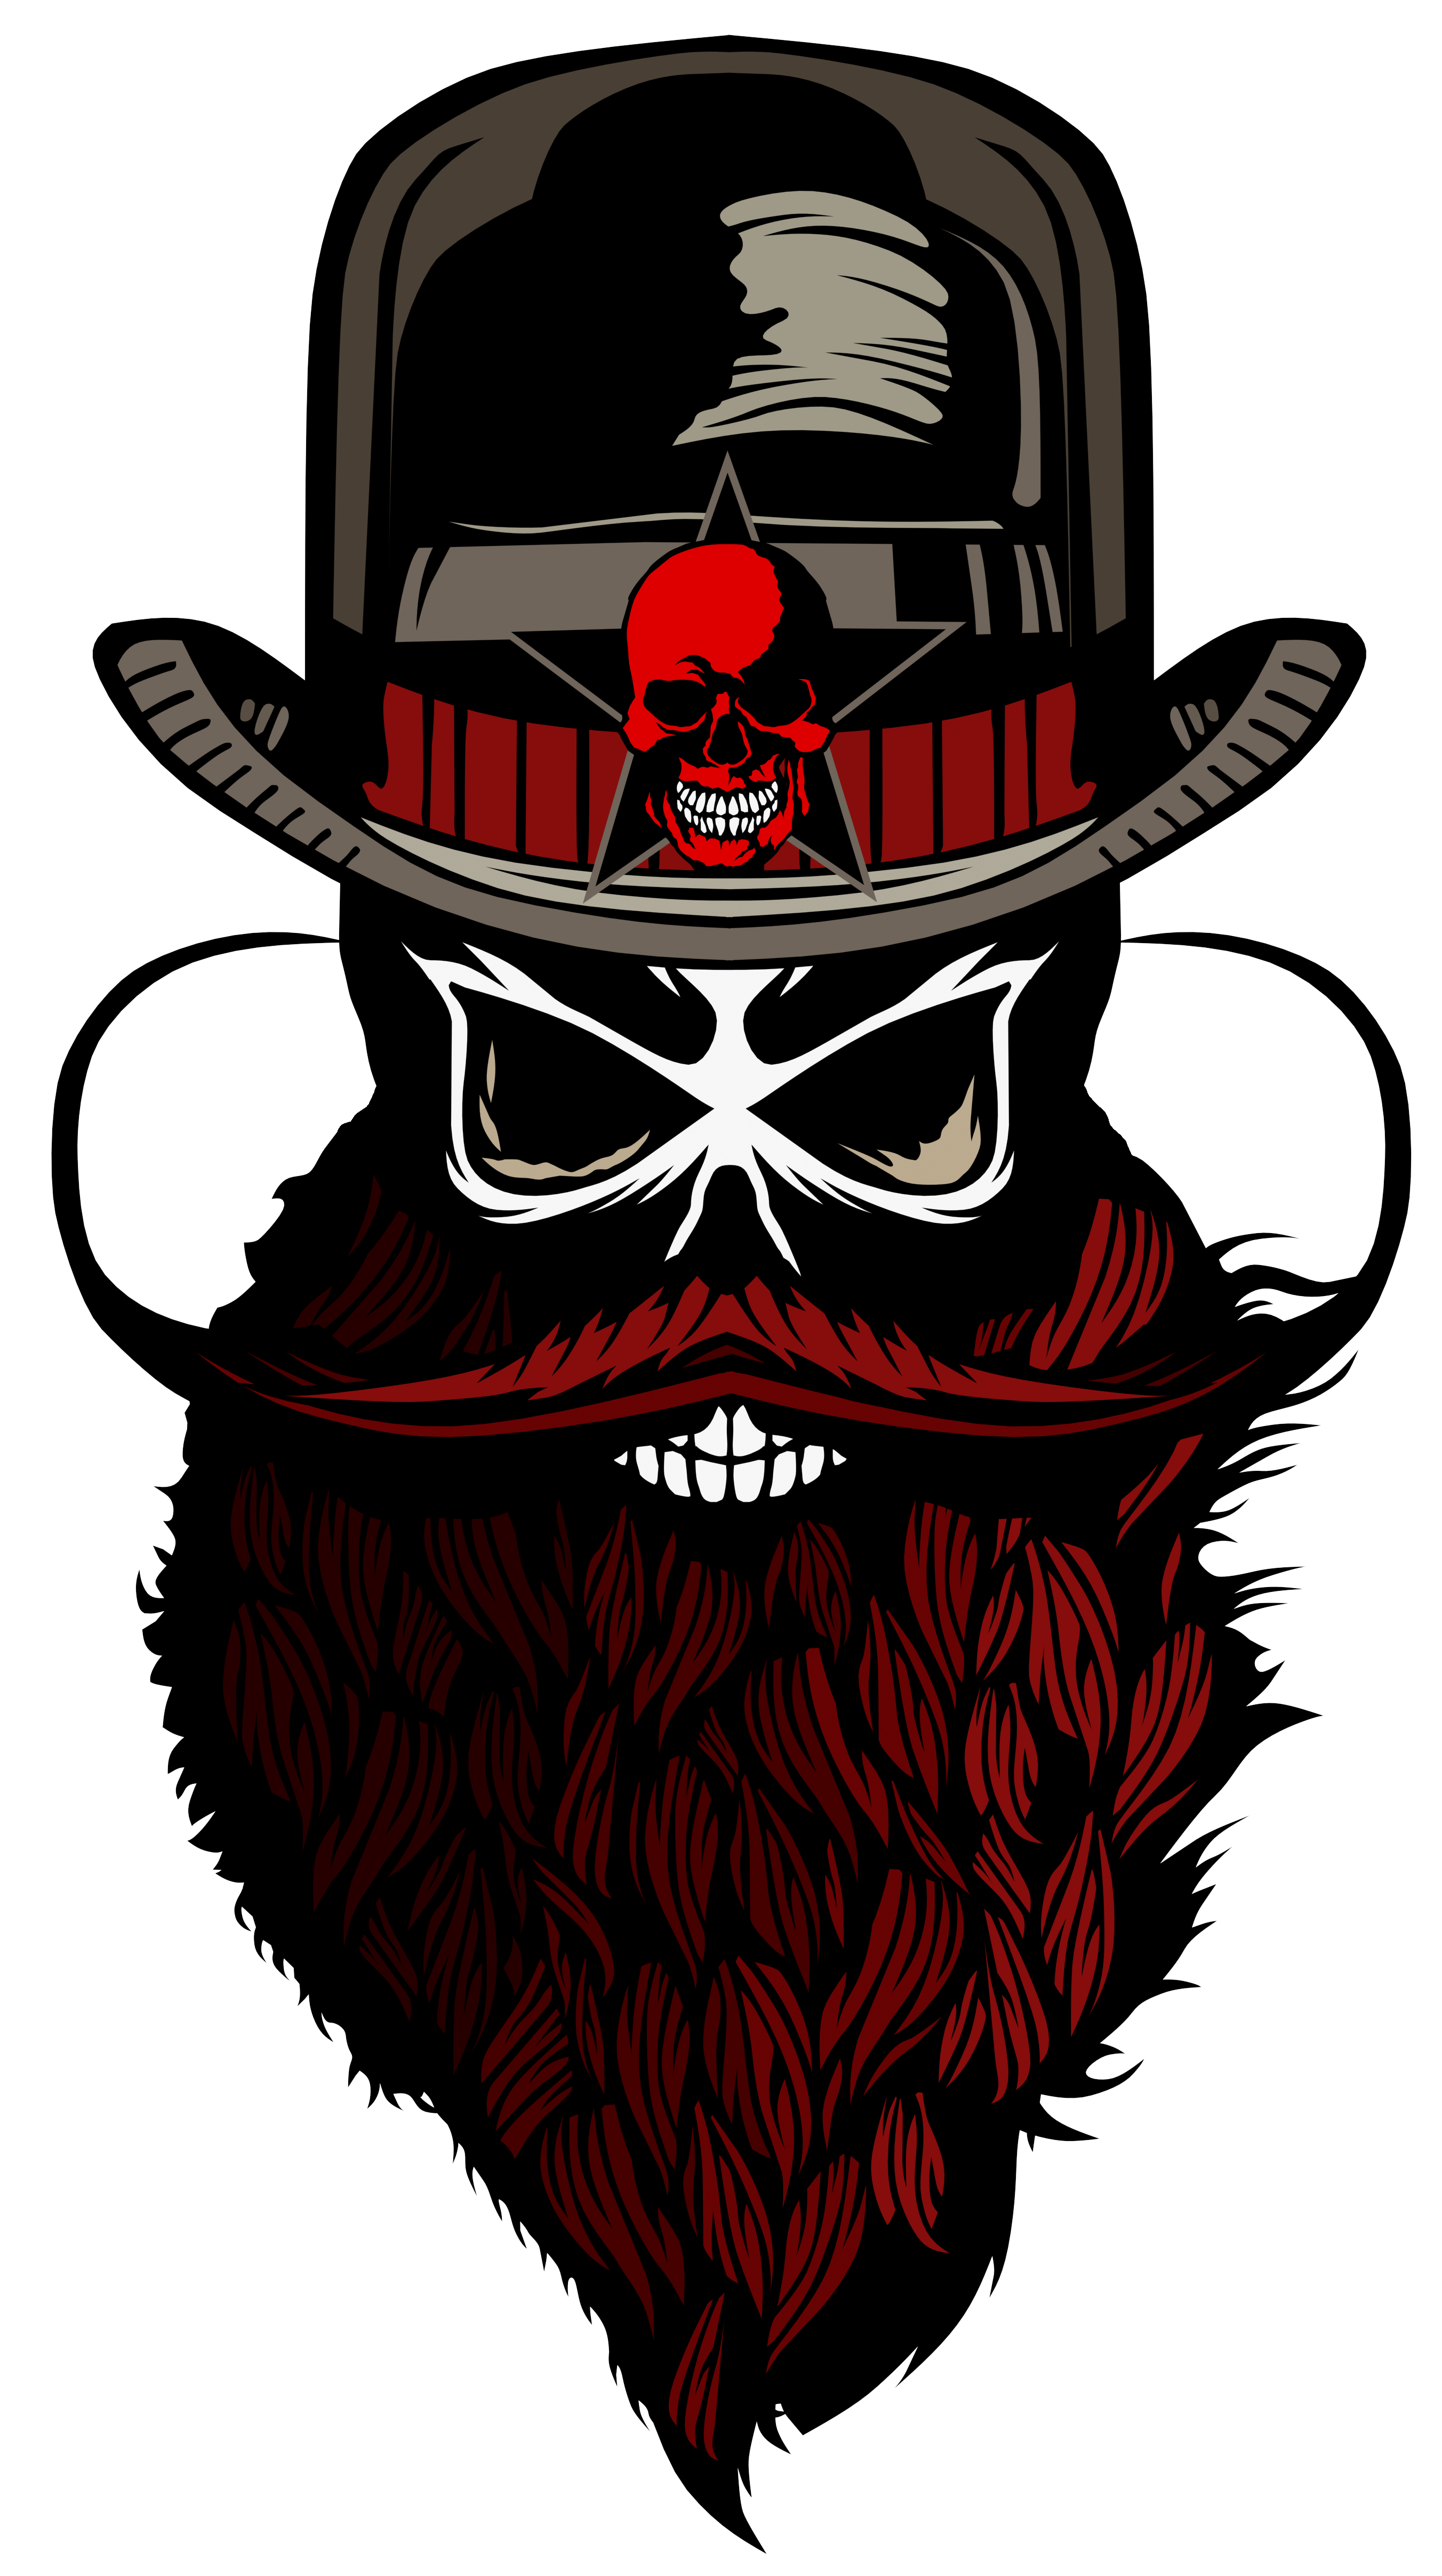 Grim reaper clipart hipster, Grim reaper hipster ...